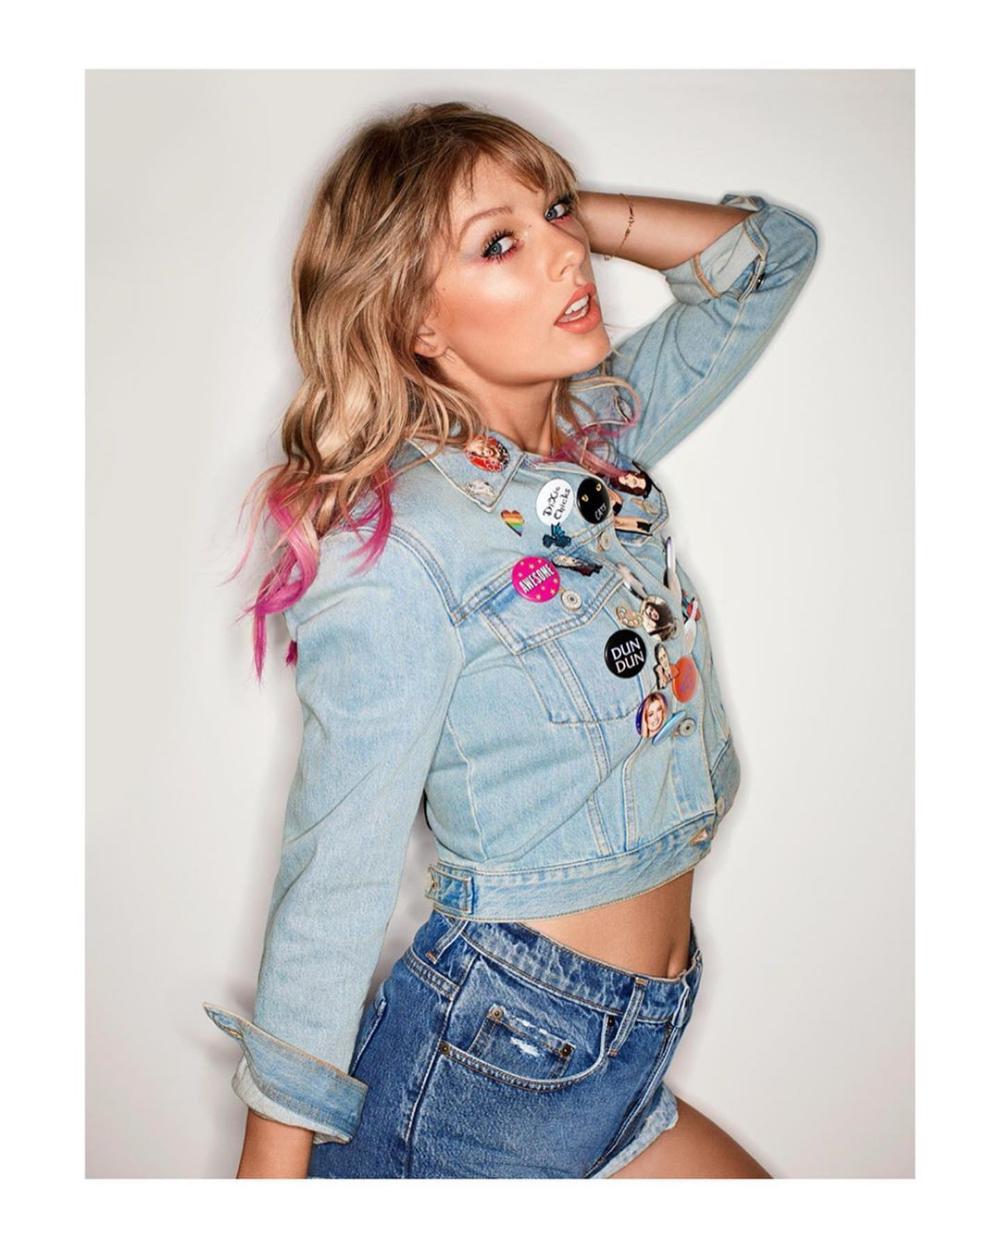 Taylorswift Youneedtocalmdown Pinspiration Jeanjacket Pins Buttons Taylor Swift Fashion Taylor [ 1250 x 1000 Pixel ]